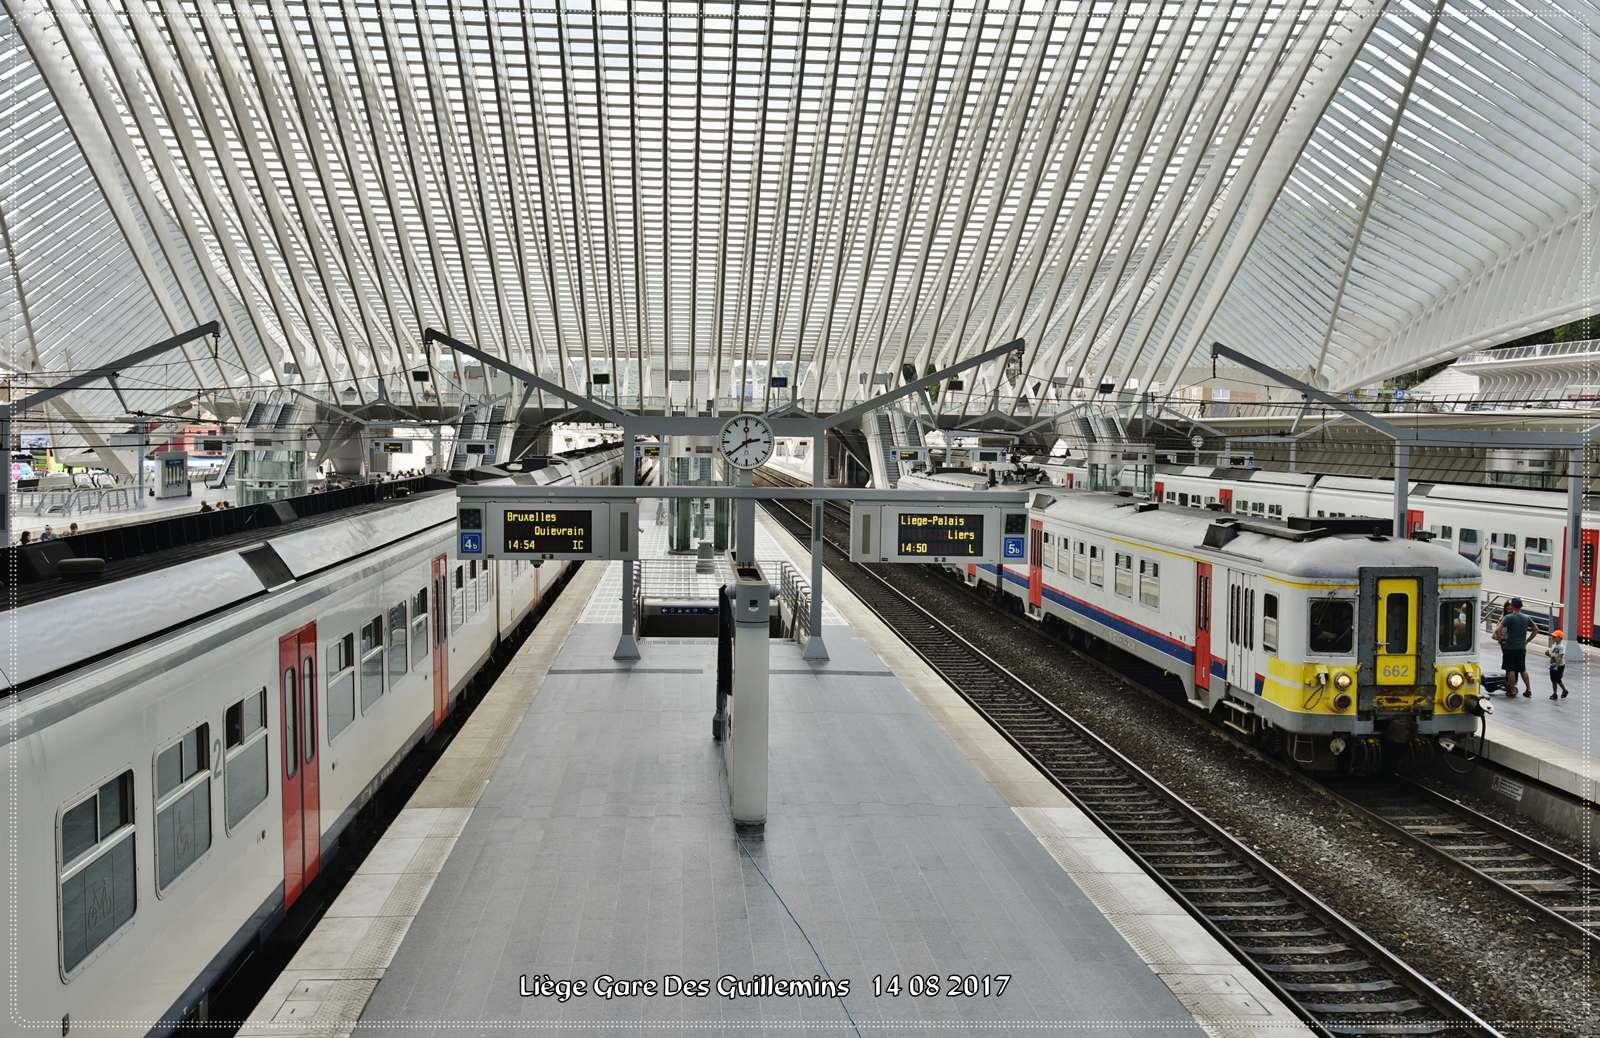 gare des guillemins5 Liege Guillemins Railway Station by Santiago Calatrava